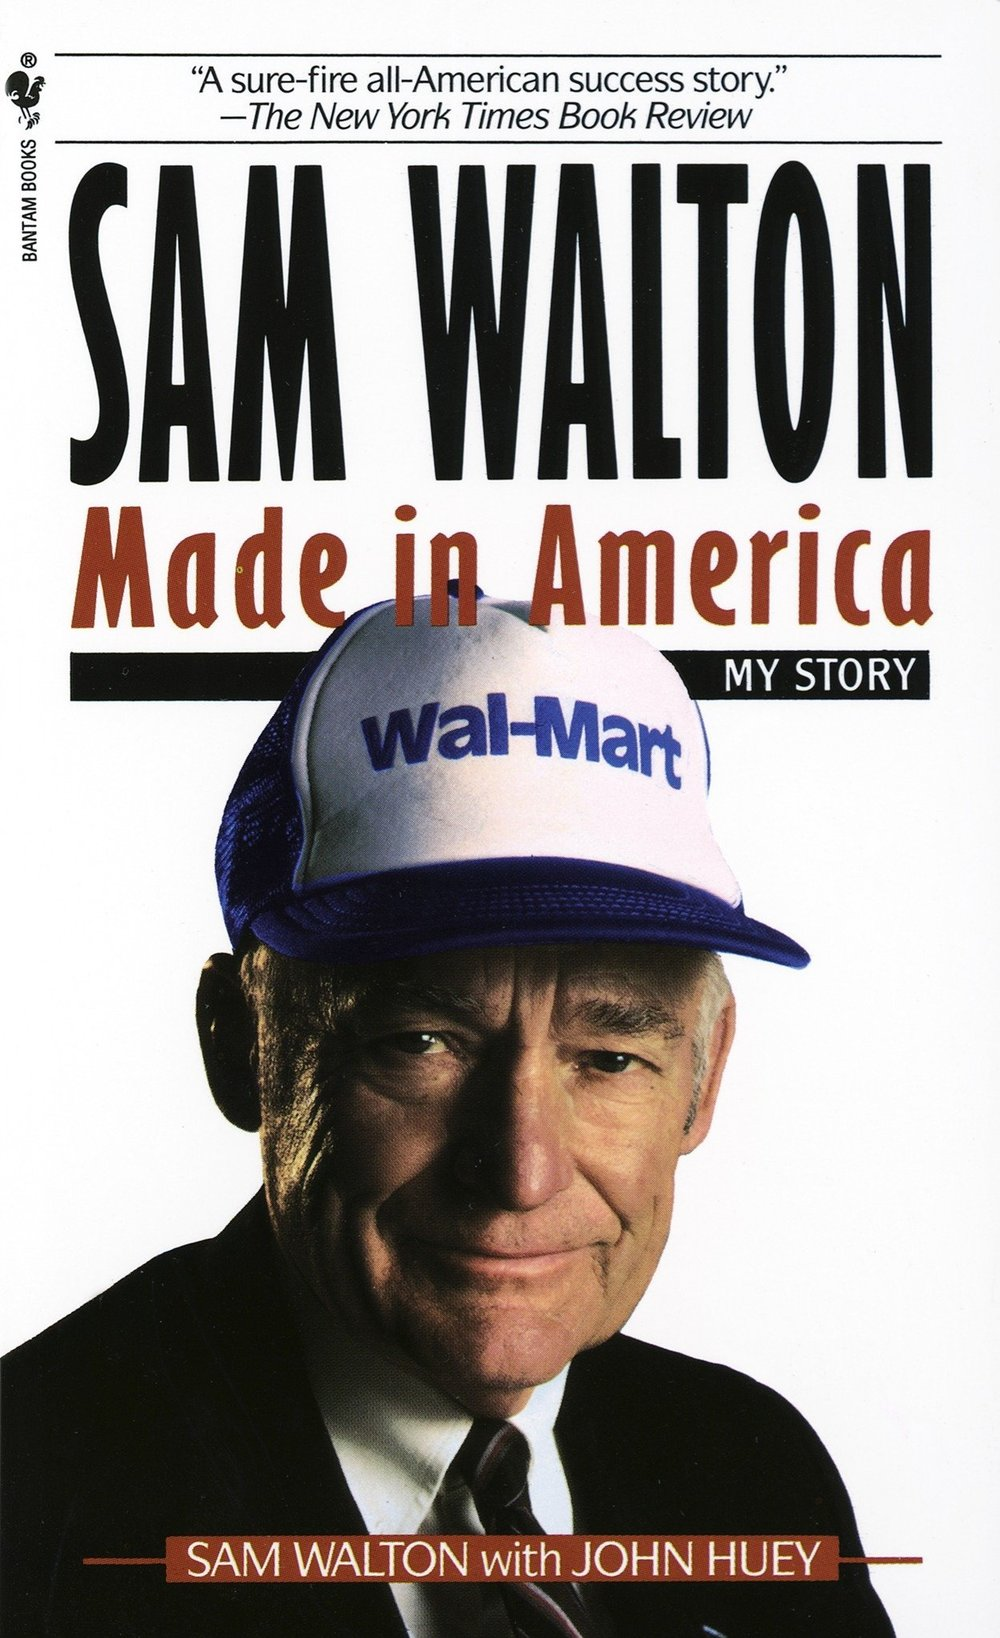 walston.jpg